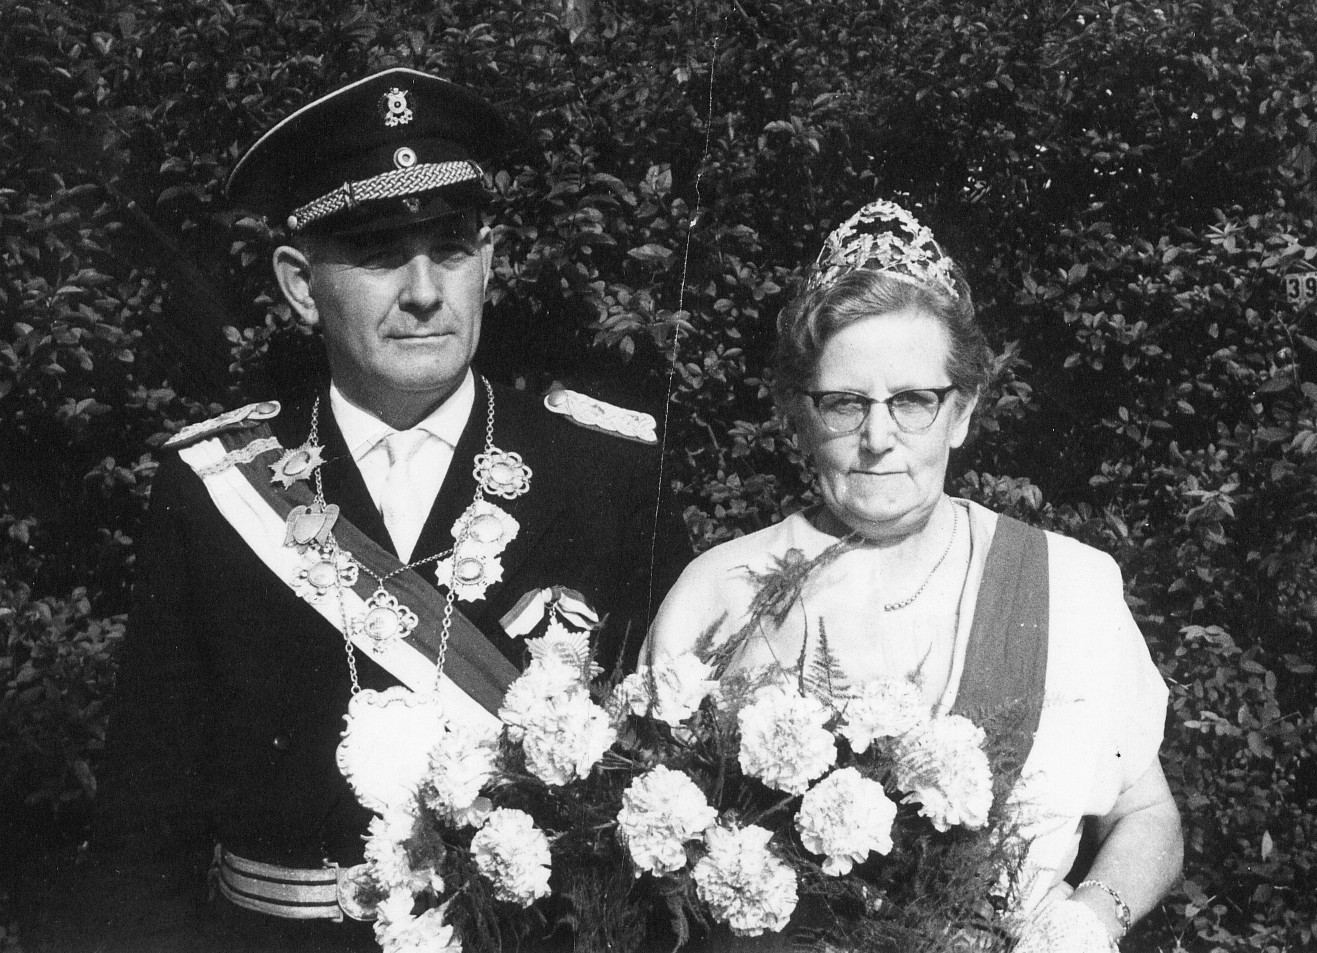 Königspaar 1961 Josef und Maria Döinghaus